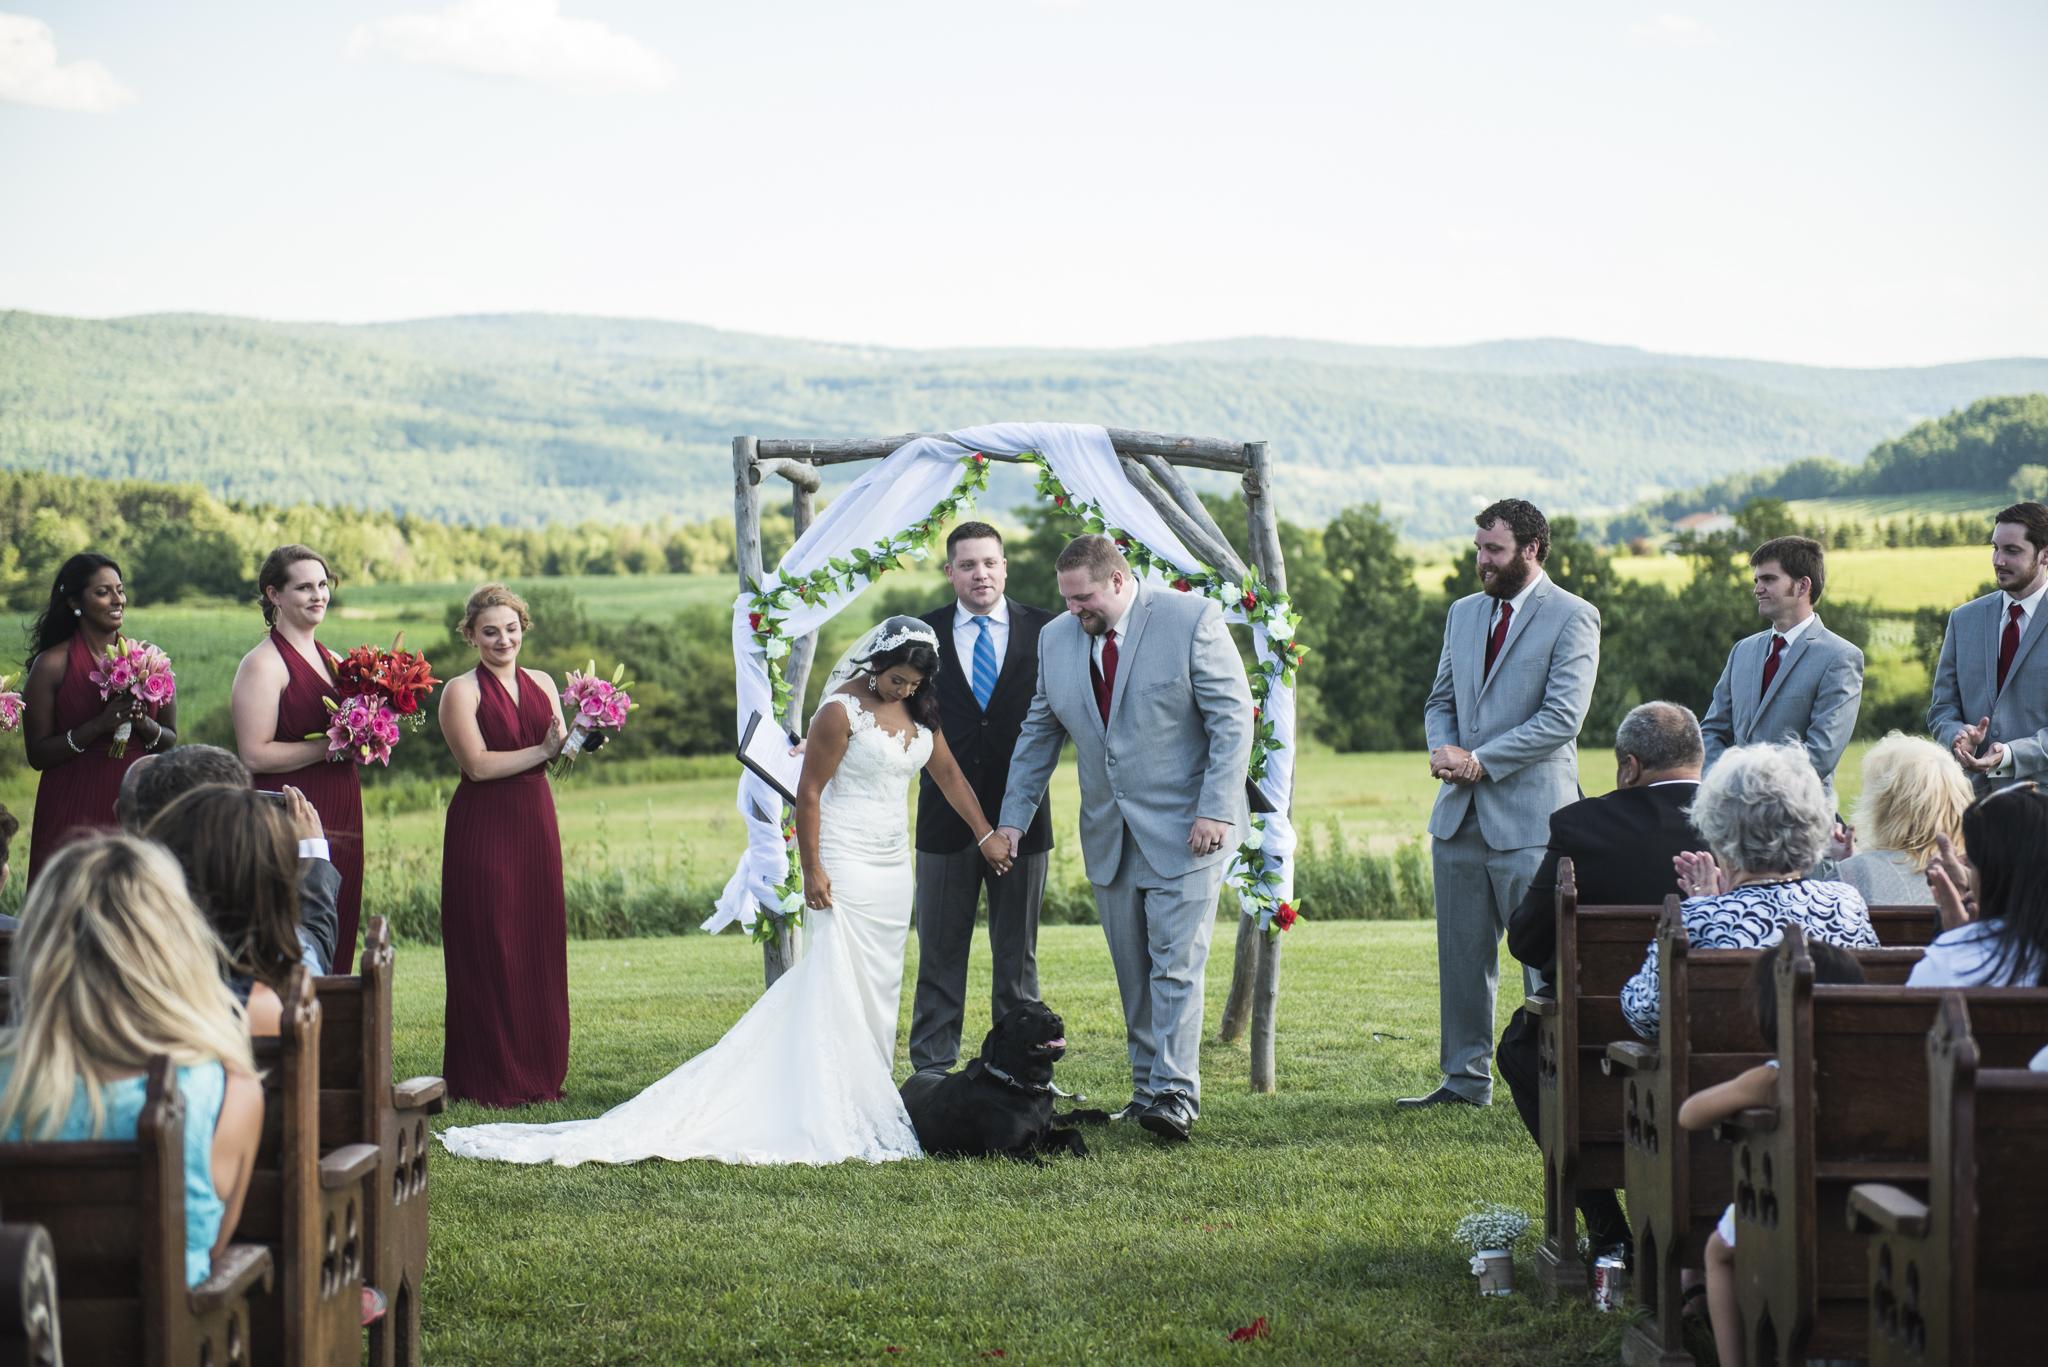 Elaine-Justin-Wedding-Online-Ceremony-101.jpg